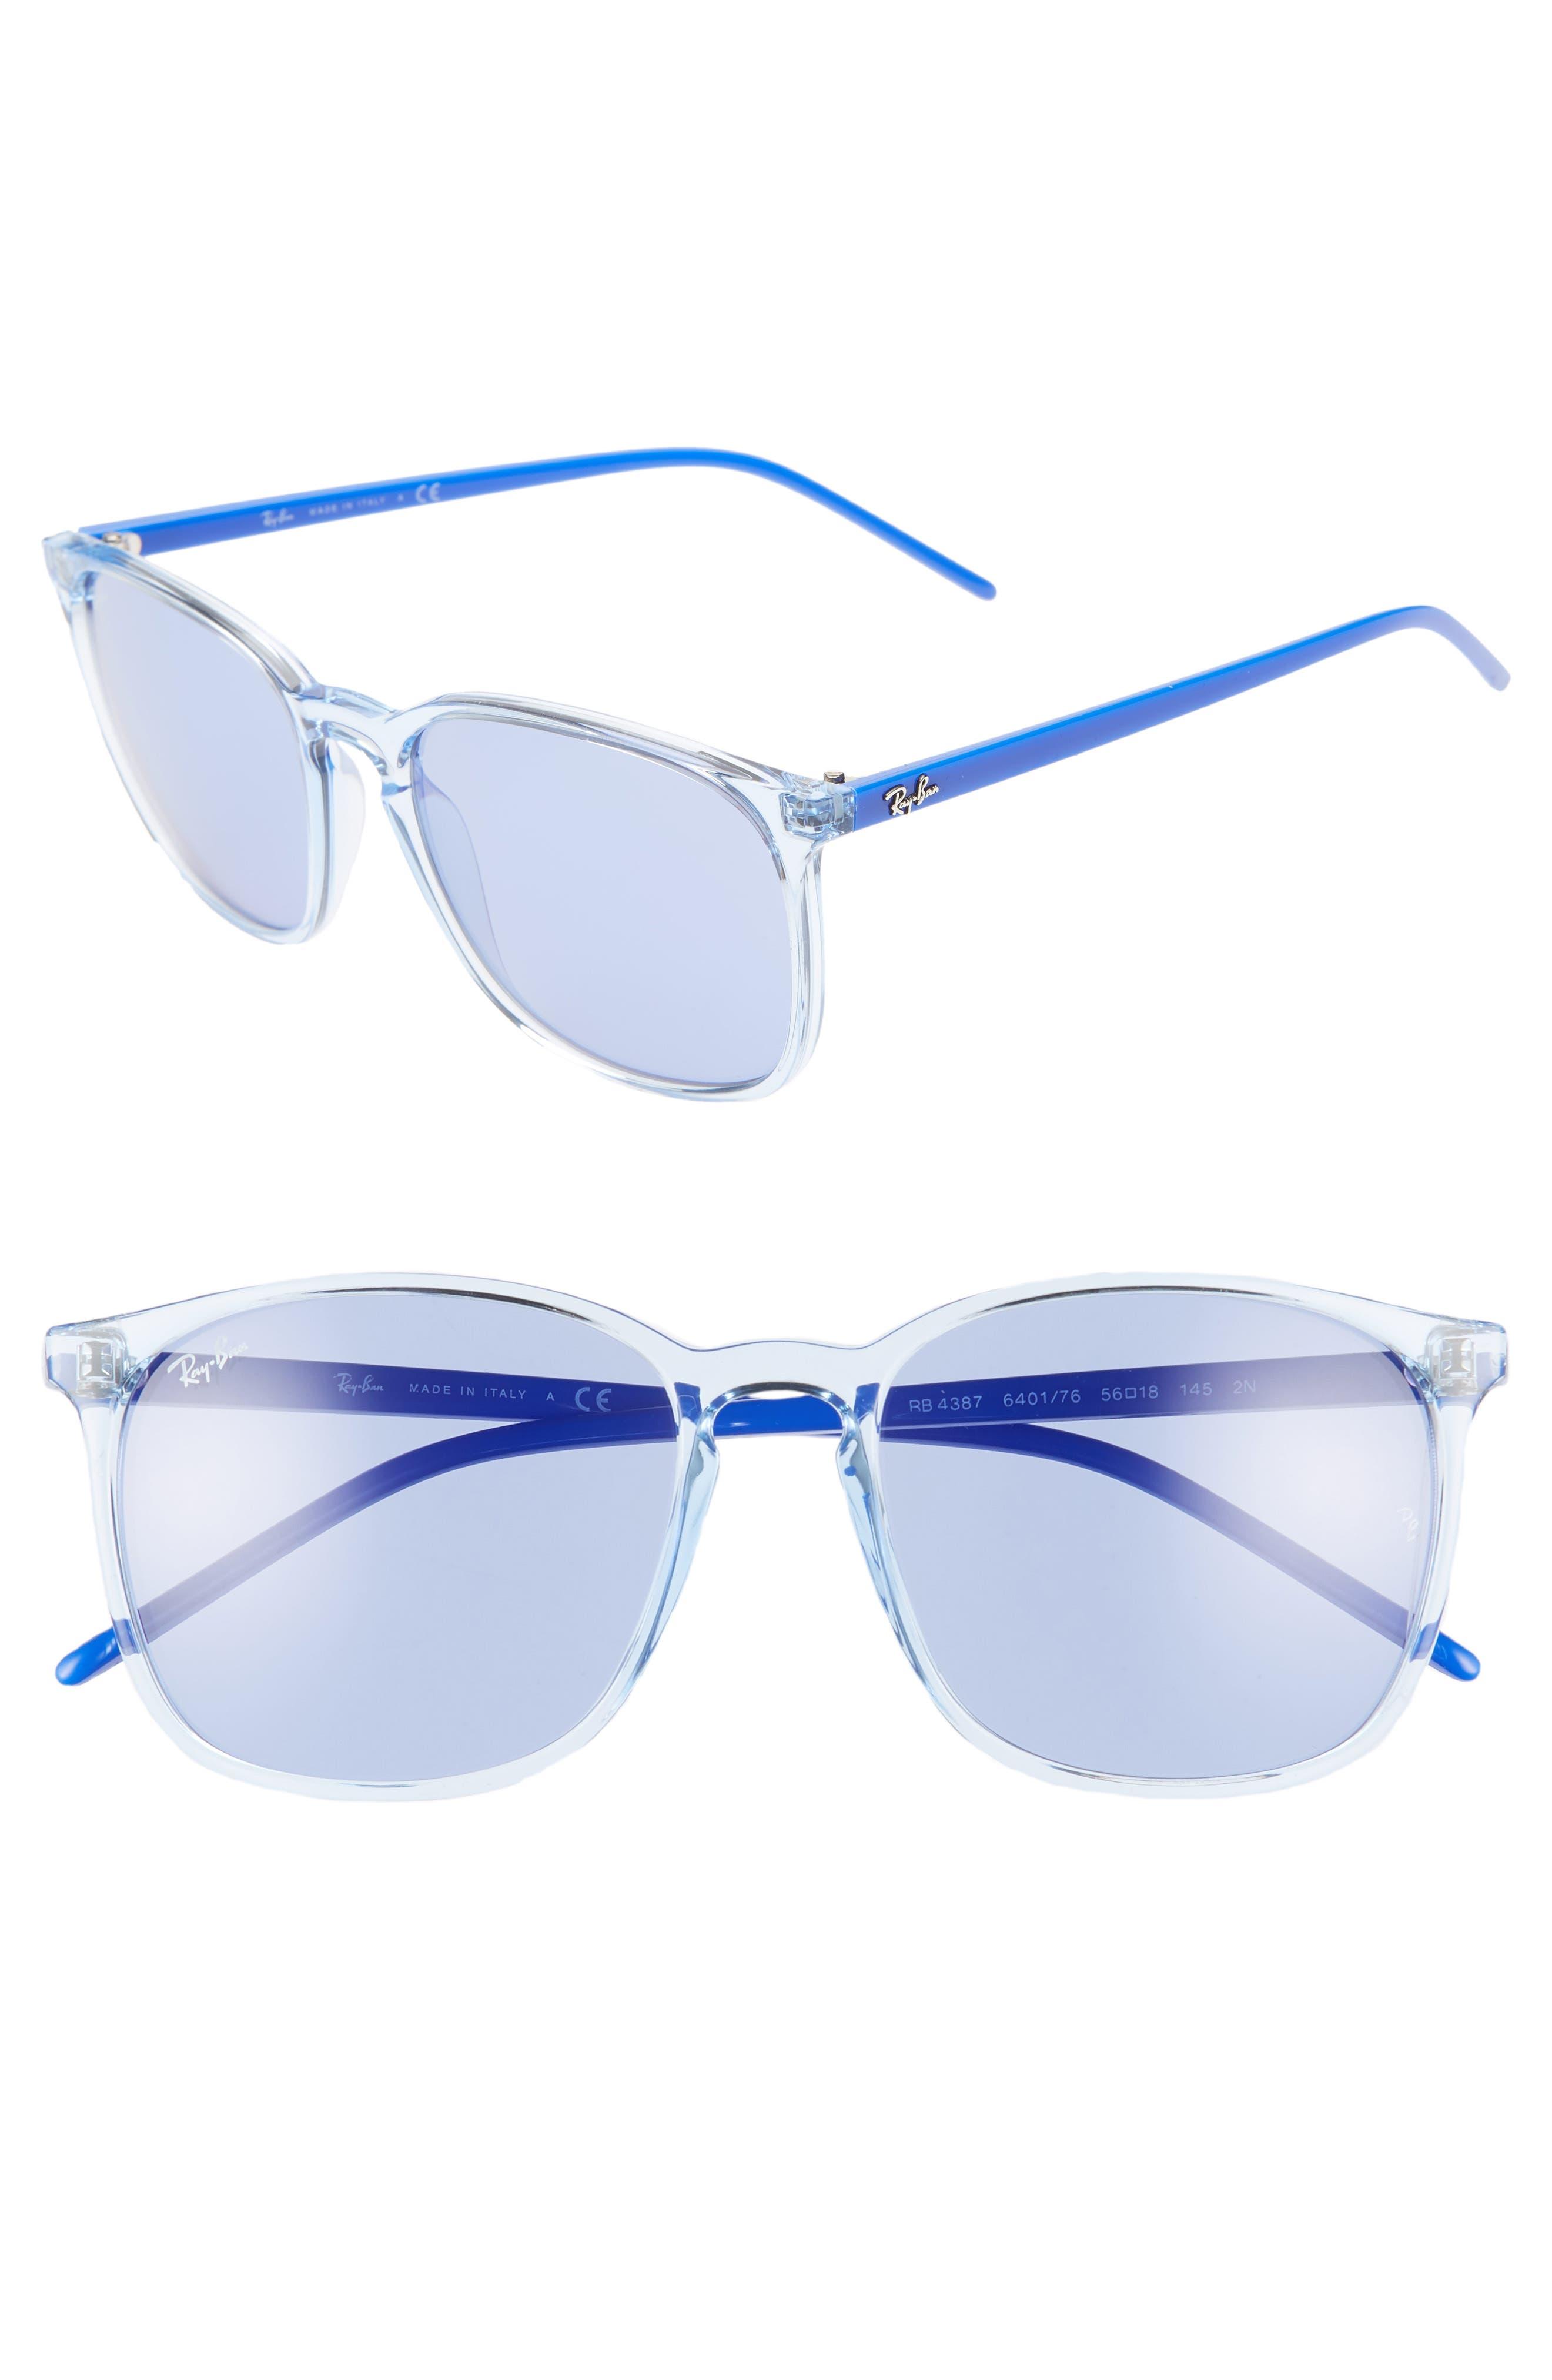 Ray-Ban 5m Sunglasses - Light Blue/ Blue Solid